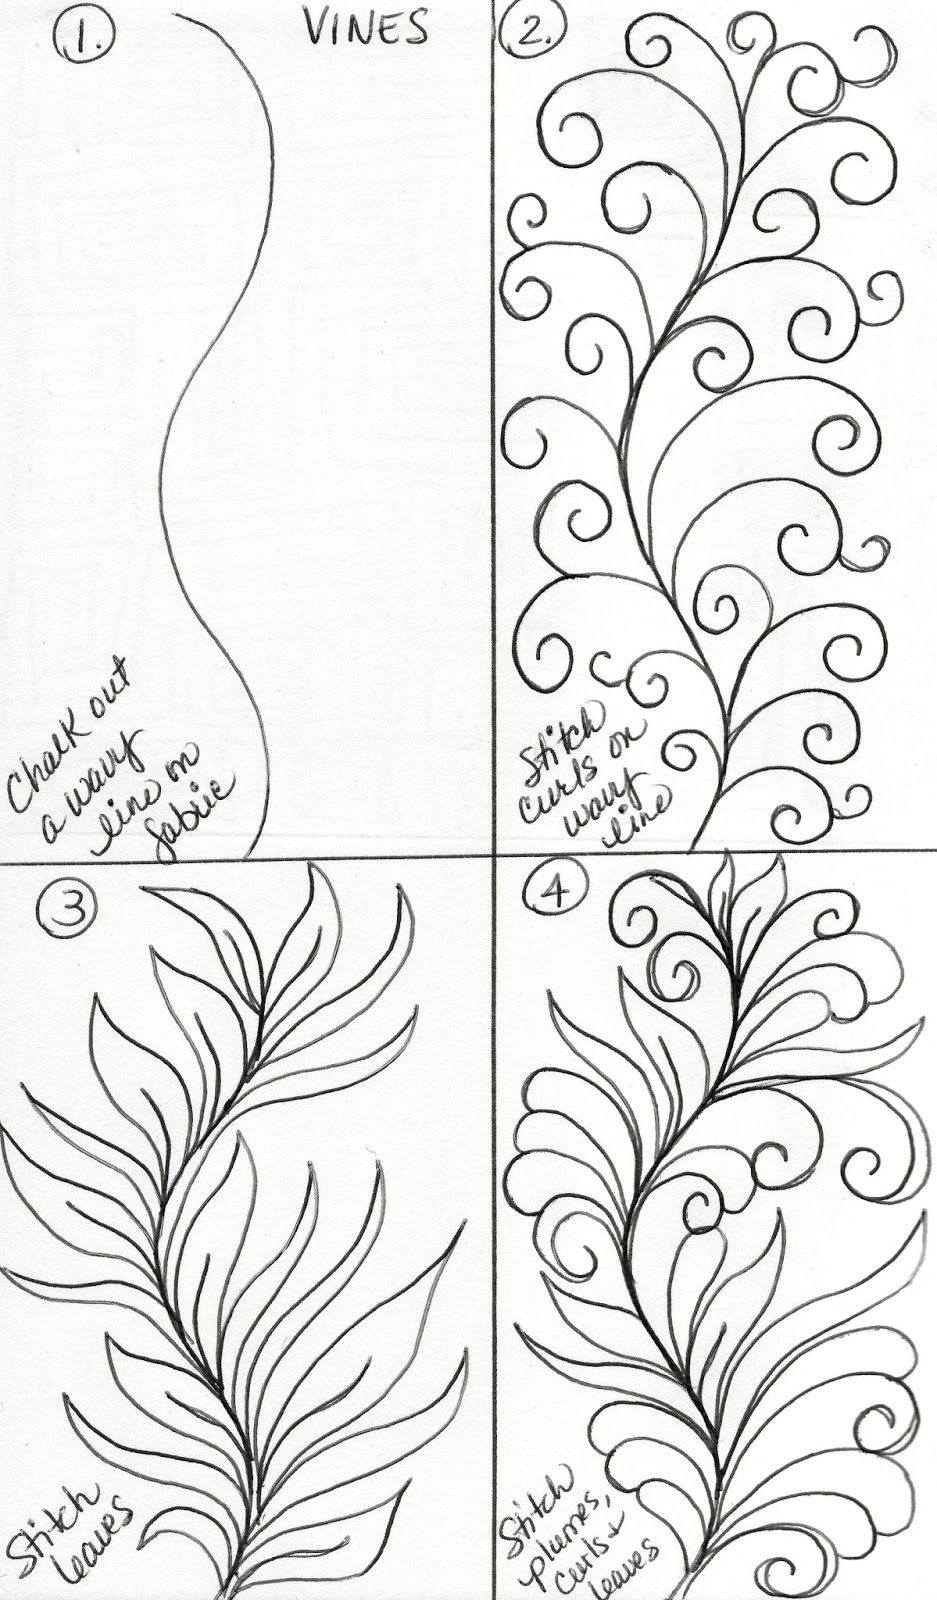 Pin By Sophia Kuo On 線條 Kresby Vzory Obrazky